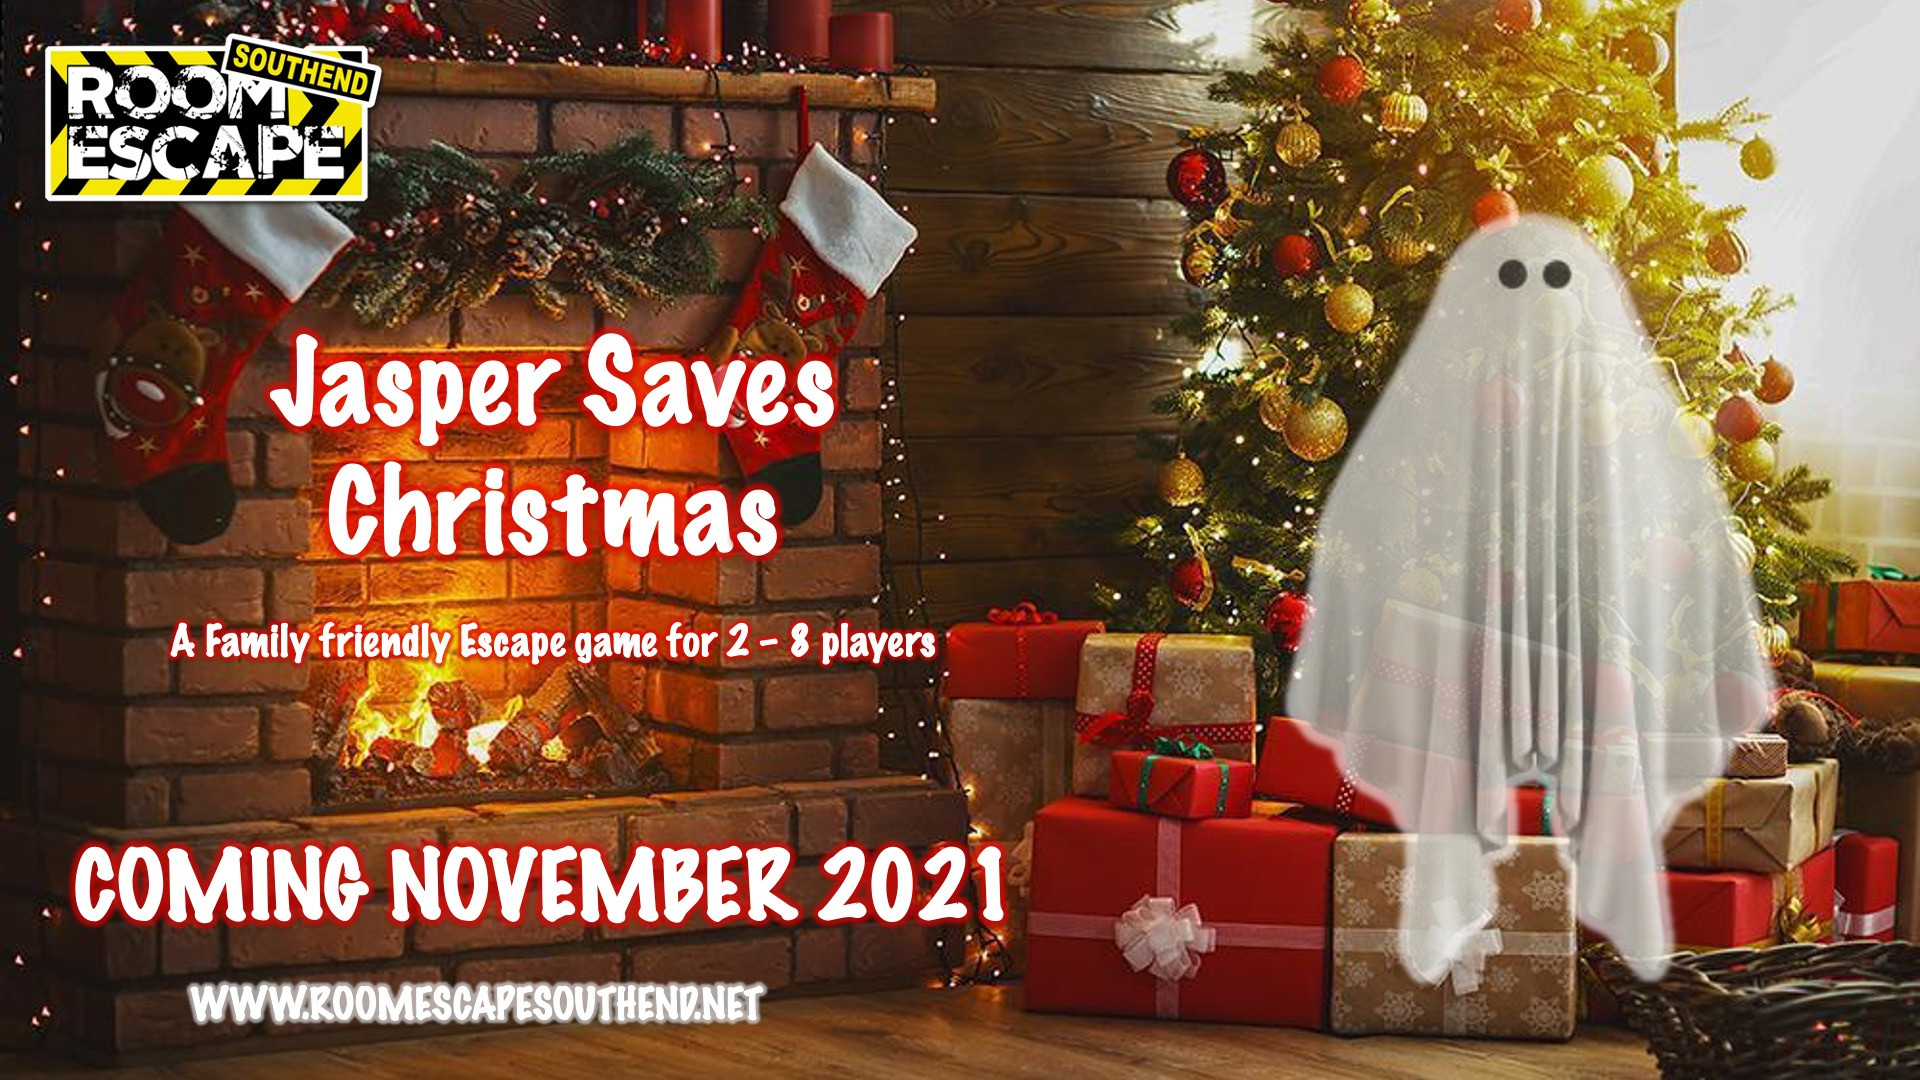 Jasper Saves Christmas